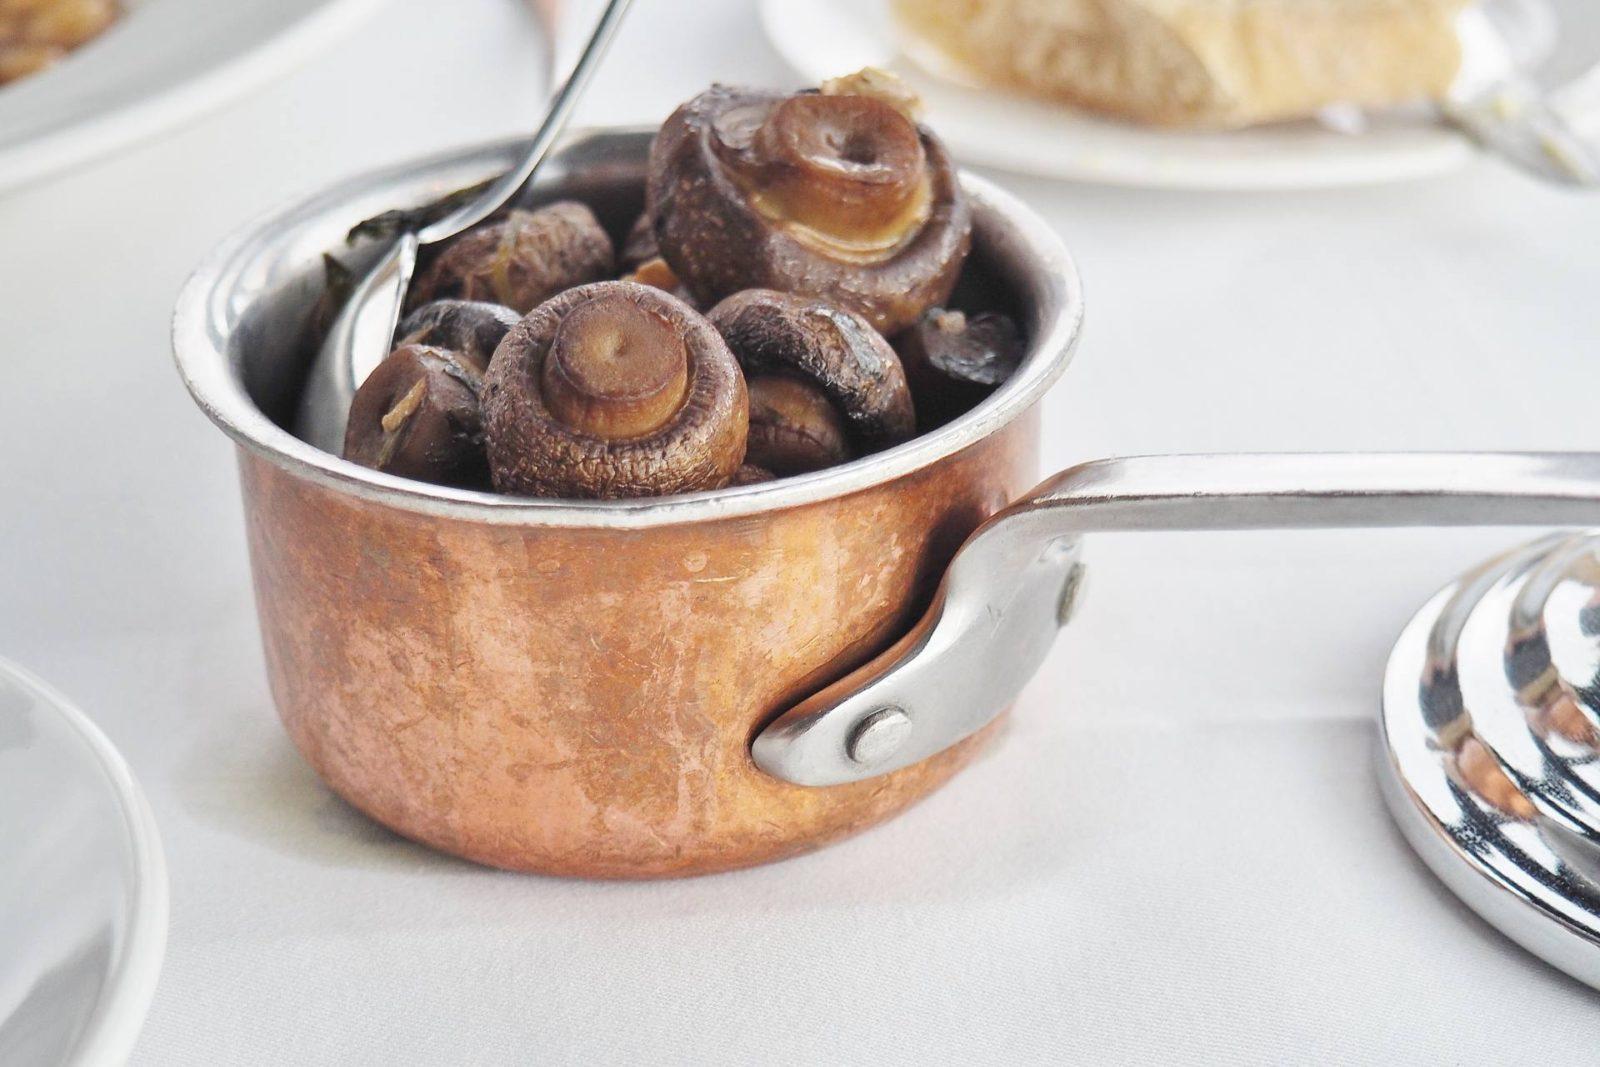 Marco-Pierre-White-Emma-Victoria-Stokes-Garlic-Mushrooms